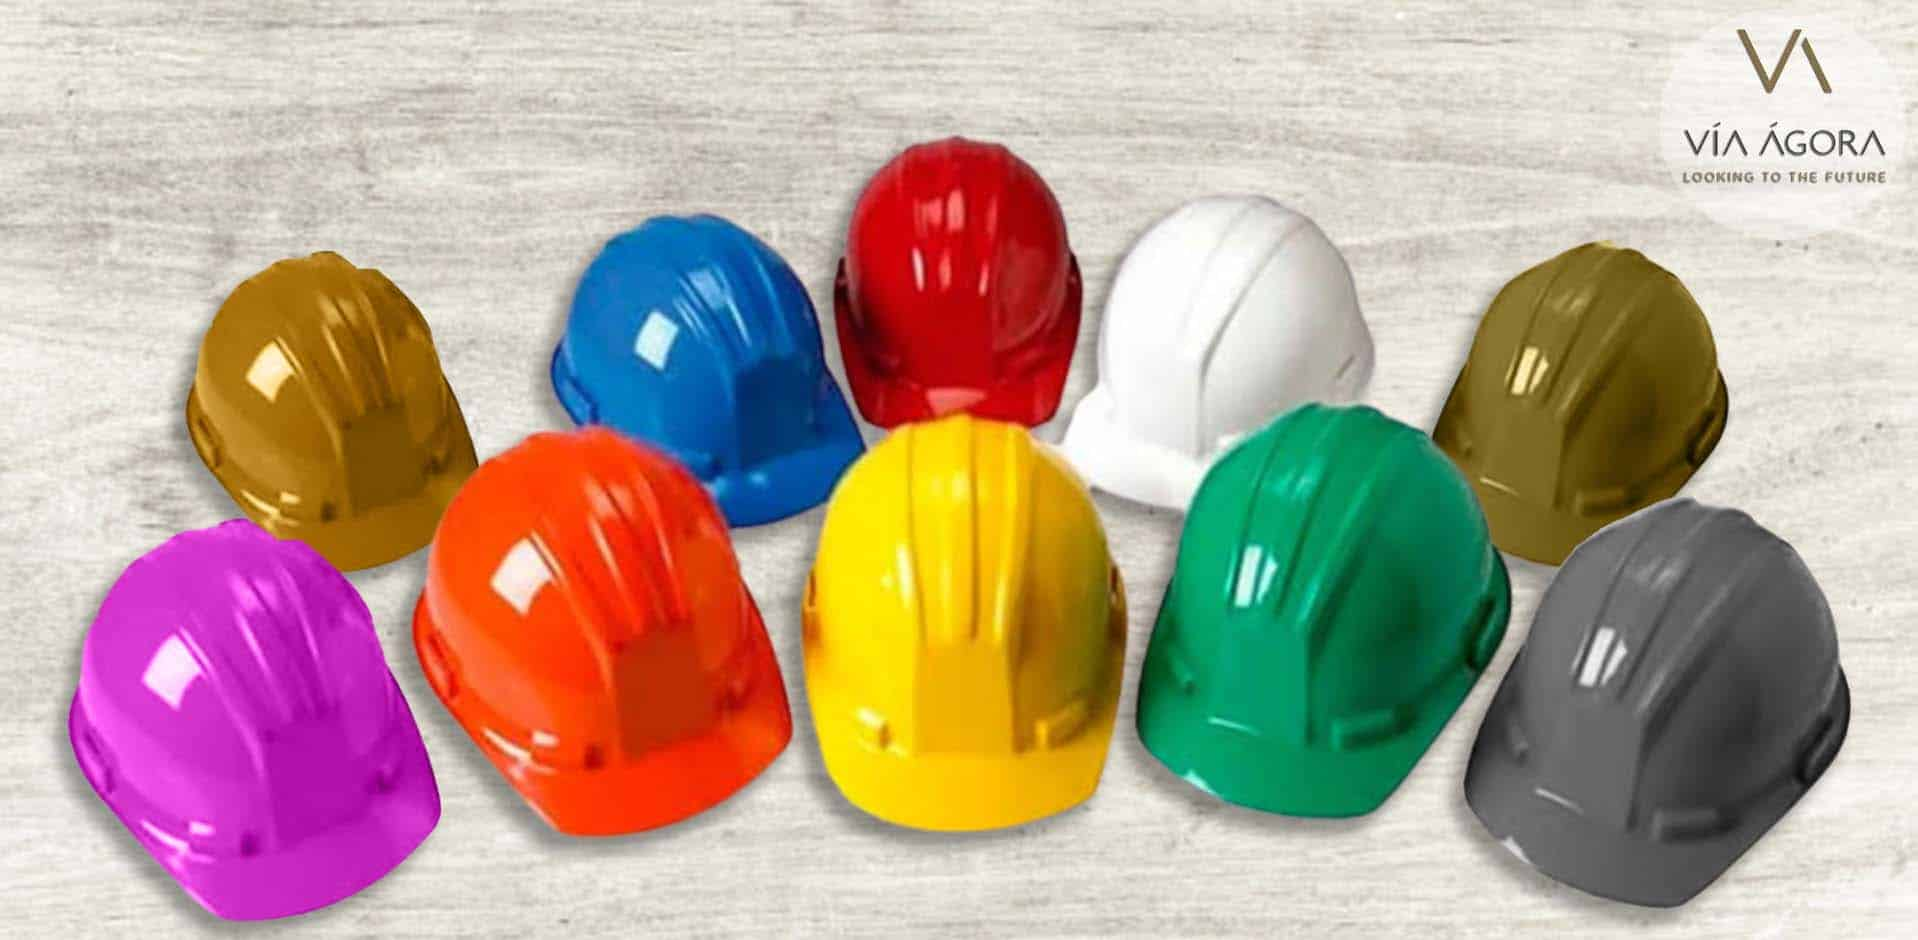 via agora - promotora inmobiliaria - cascos de construcción - 7